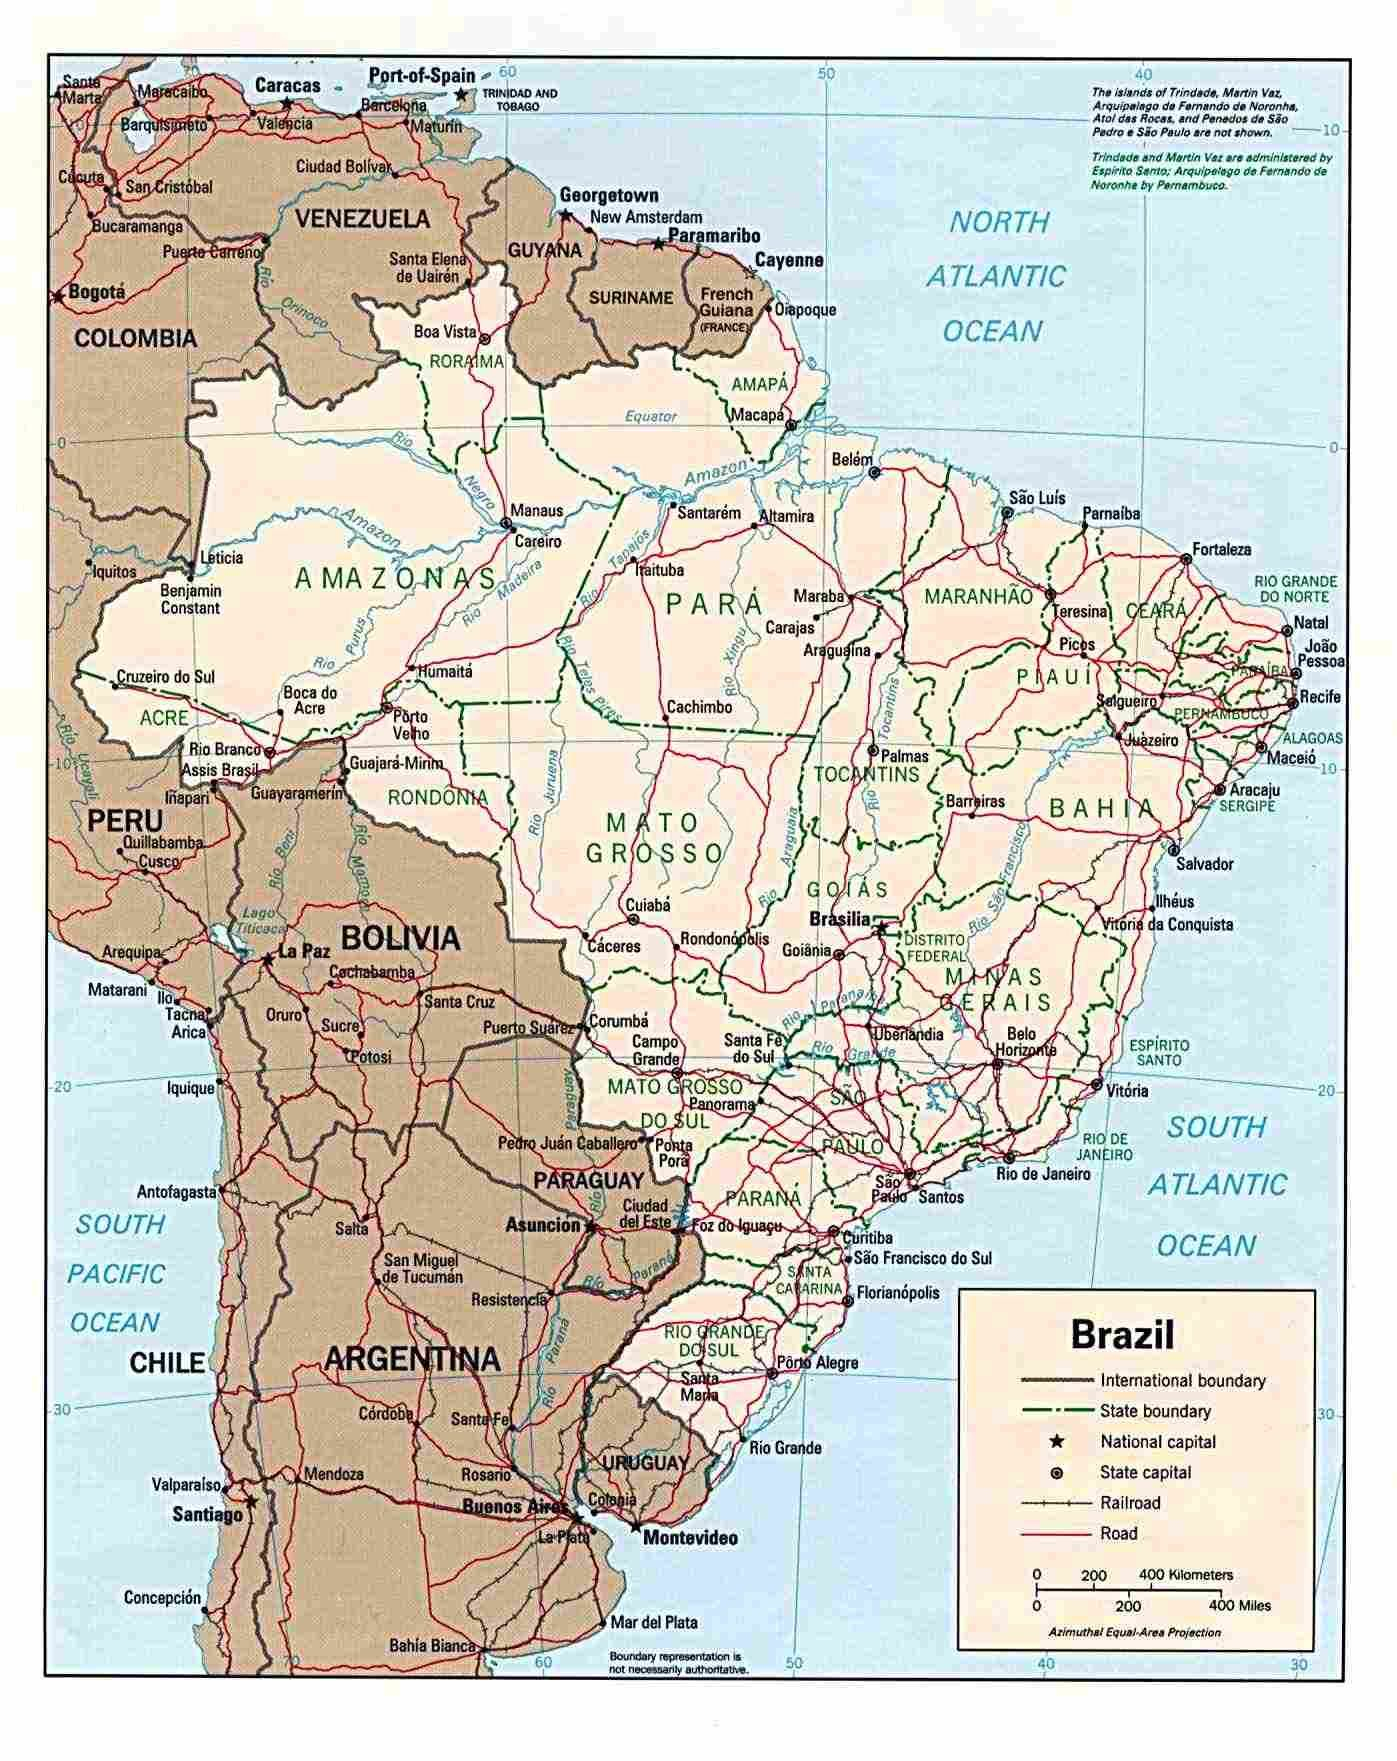 Http://www.brazil-Help/brazil-Map | Mapas | Pinterest | Brazil - Free Printable Map Of Brazil